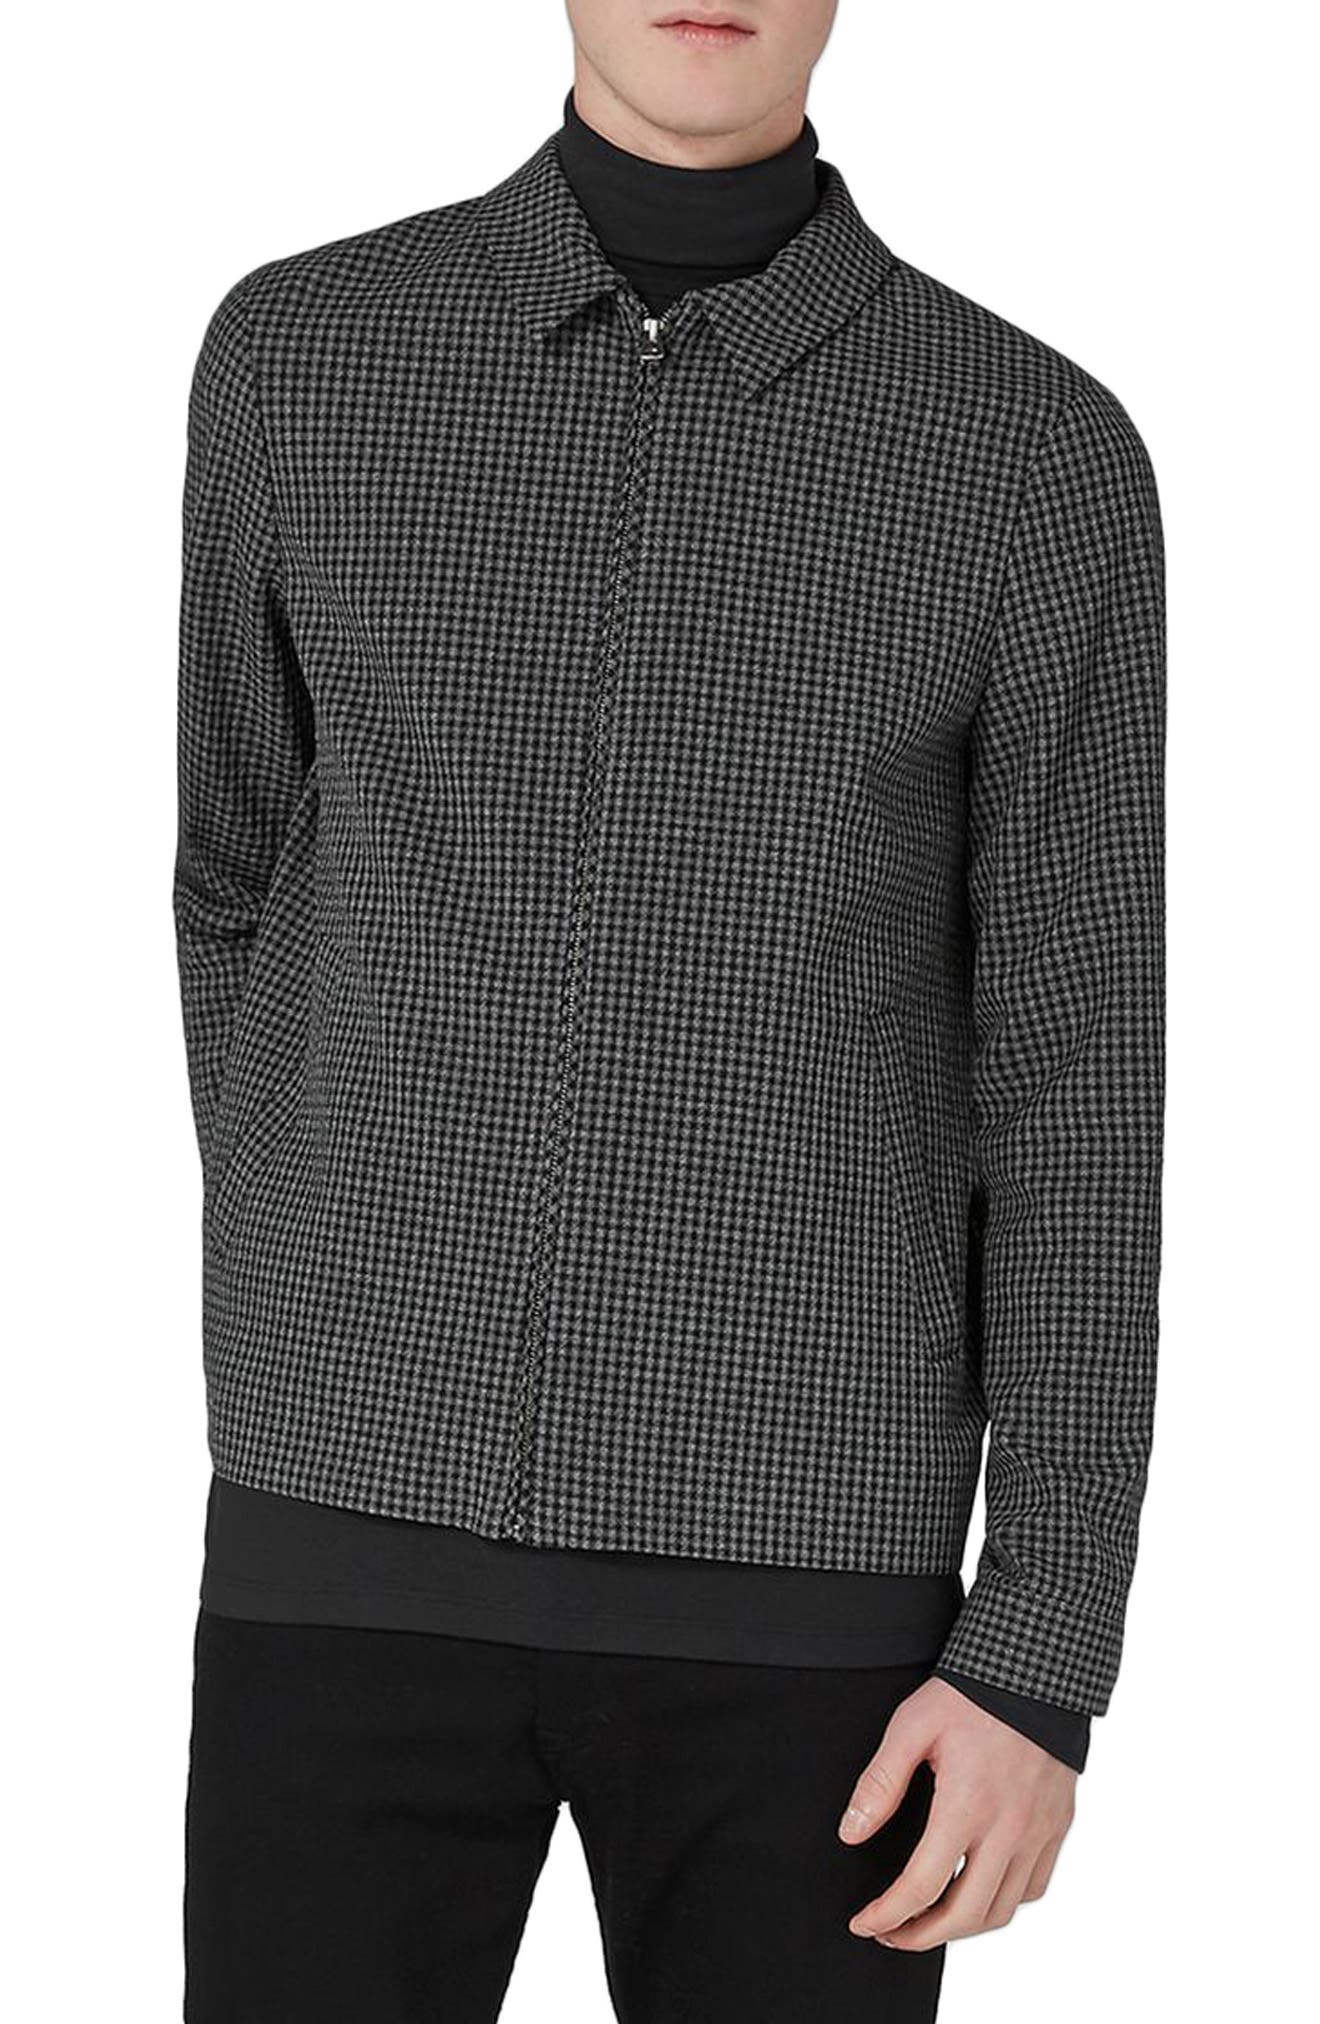 Gingham Harrington Jacket,                             Main thumbnail 1, color,                             Grey Multi